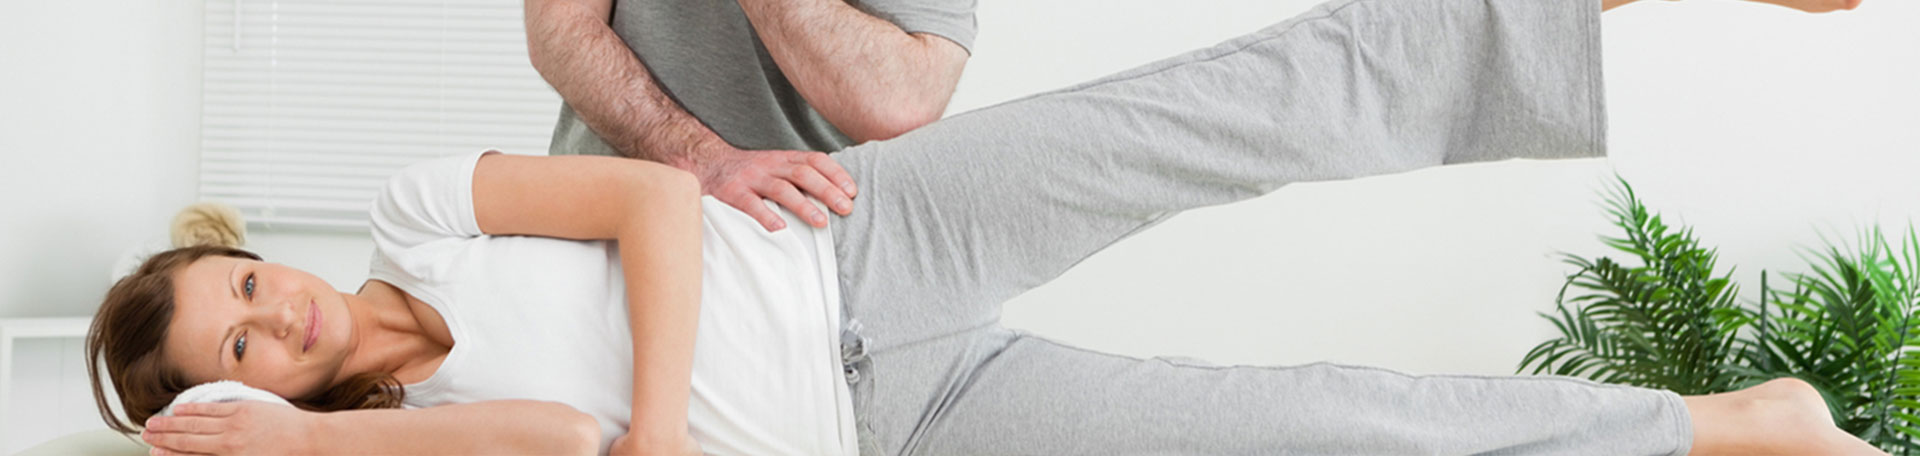 Fisioterapeuta en sevilla